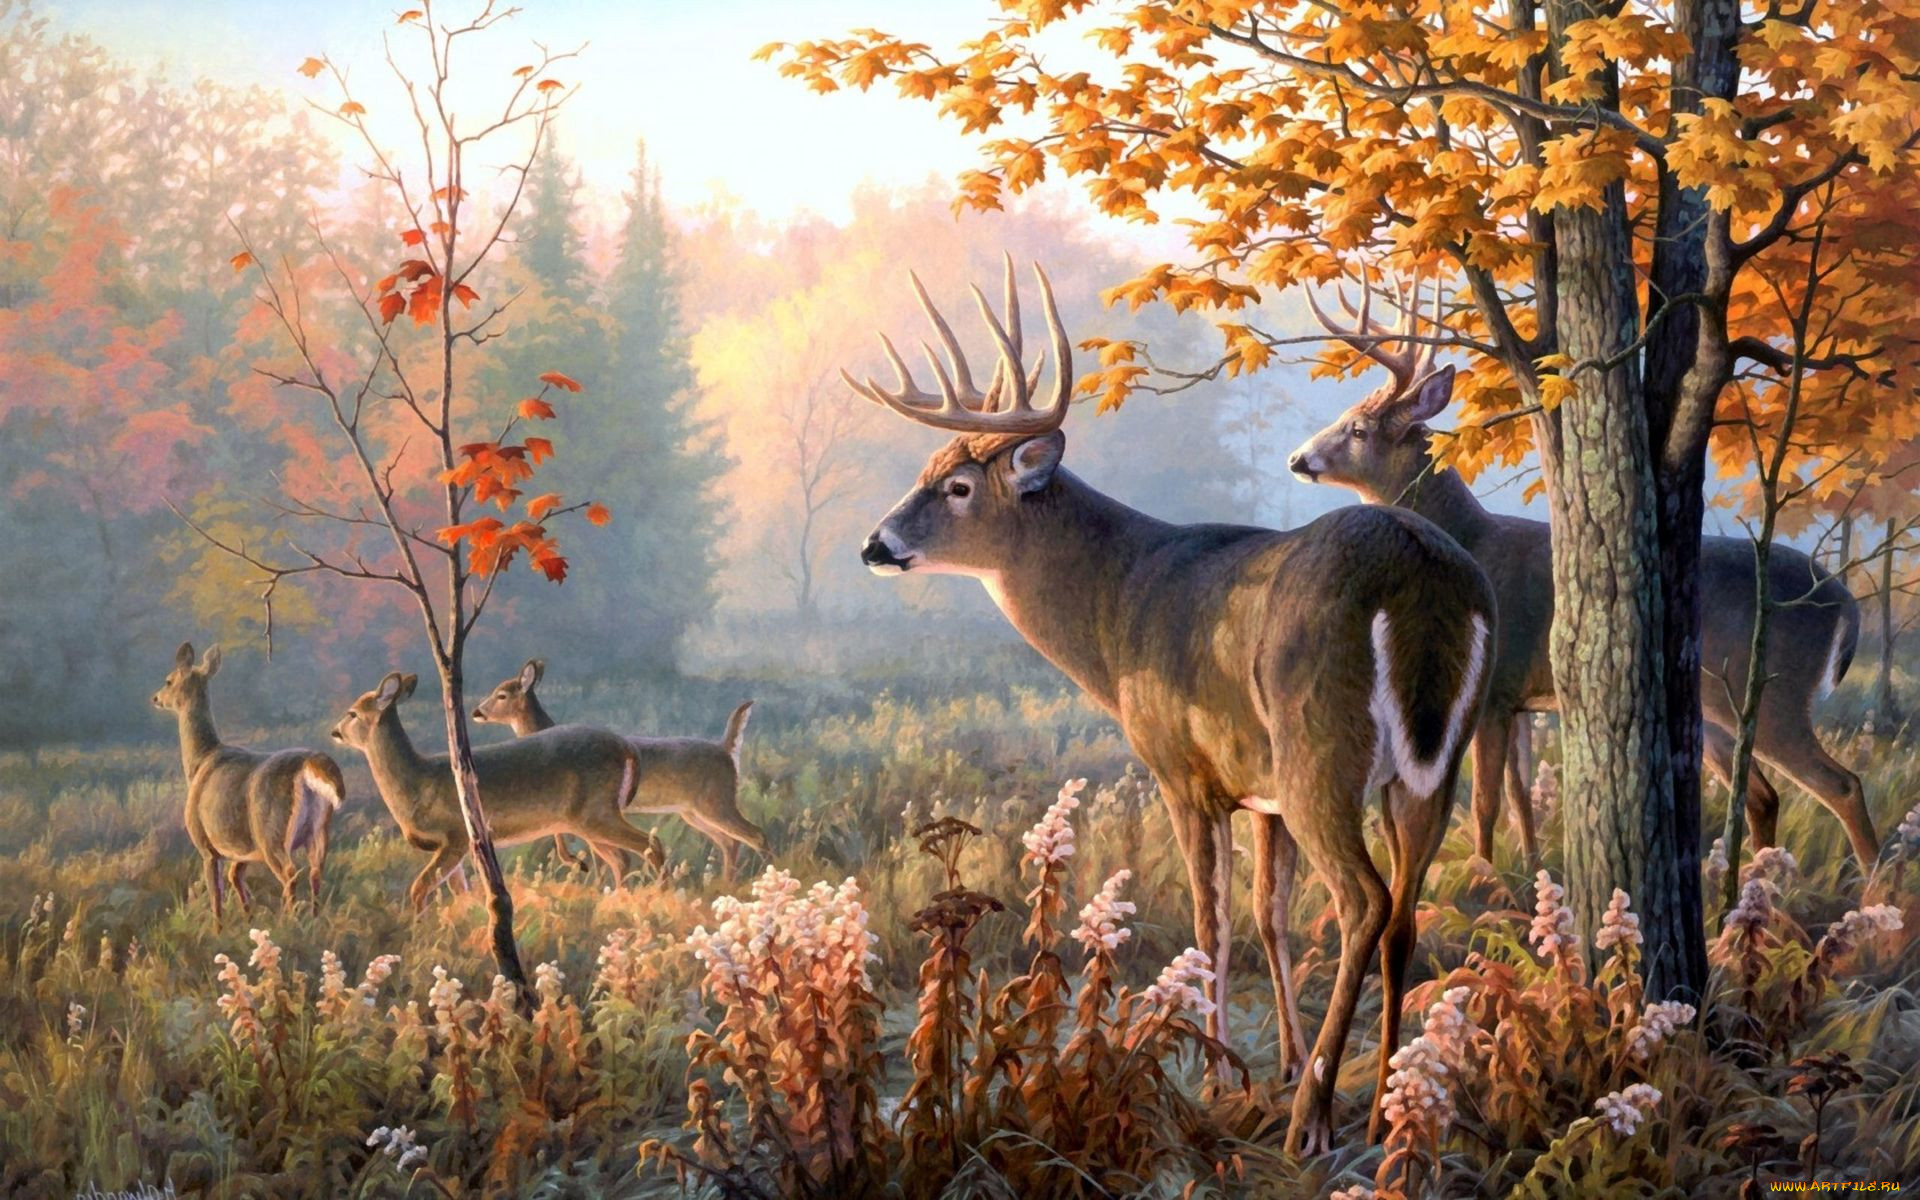 Картинка осенний лес и звери